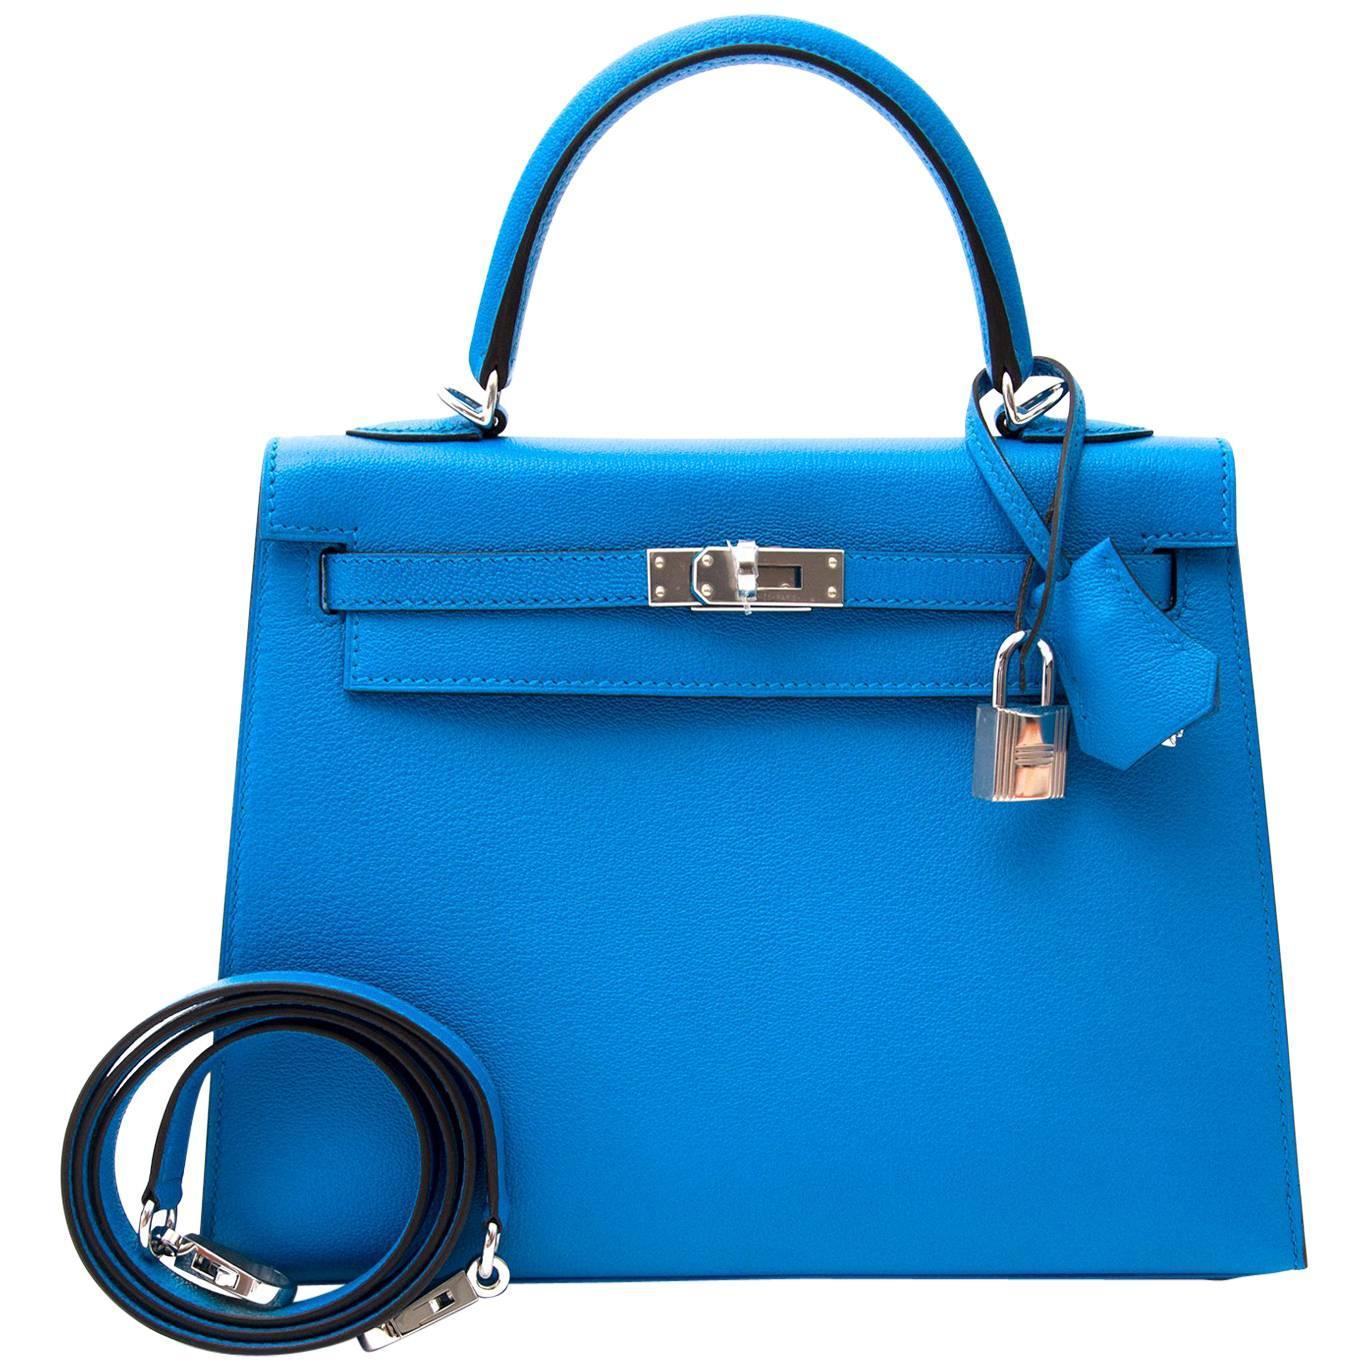 449a03189842 Labellov Handbags and Purses - 1stdibs - Page 8